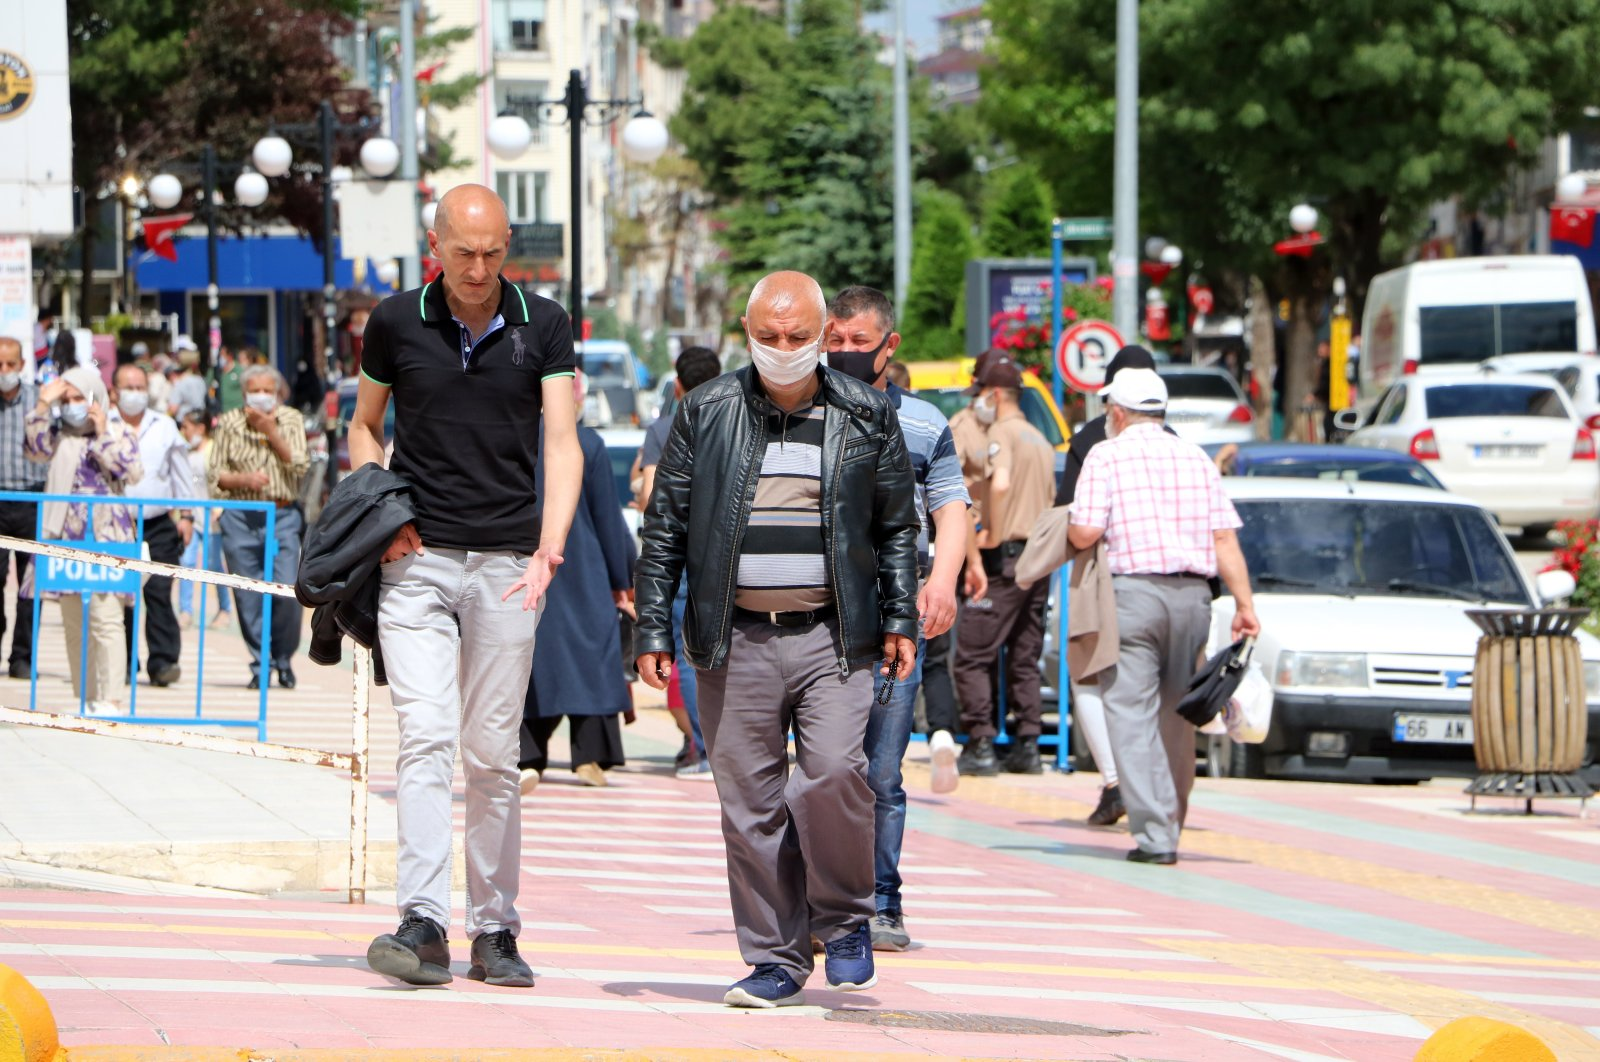 A man wearing a mask walks next to another man not wearing a mask in Yozgat, Turkey, June 23, 2020. (IHA Photo)